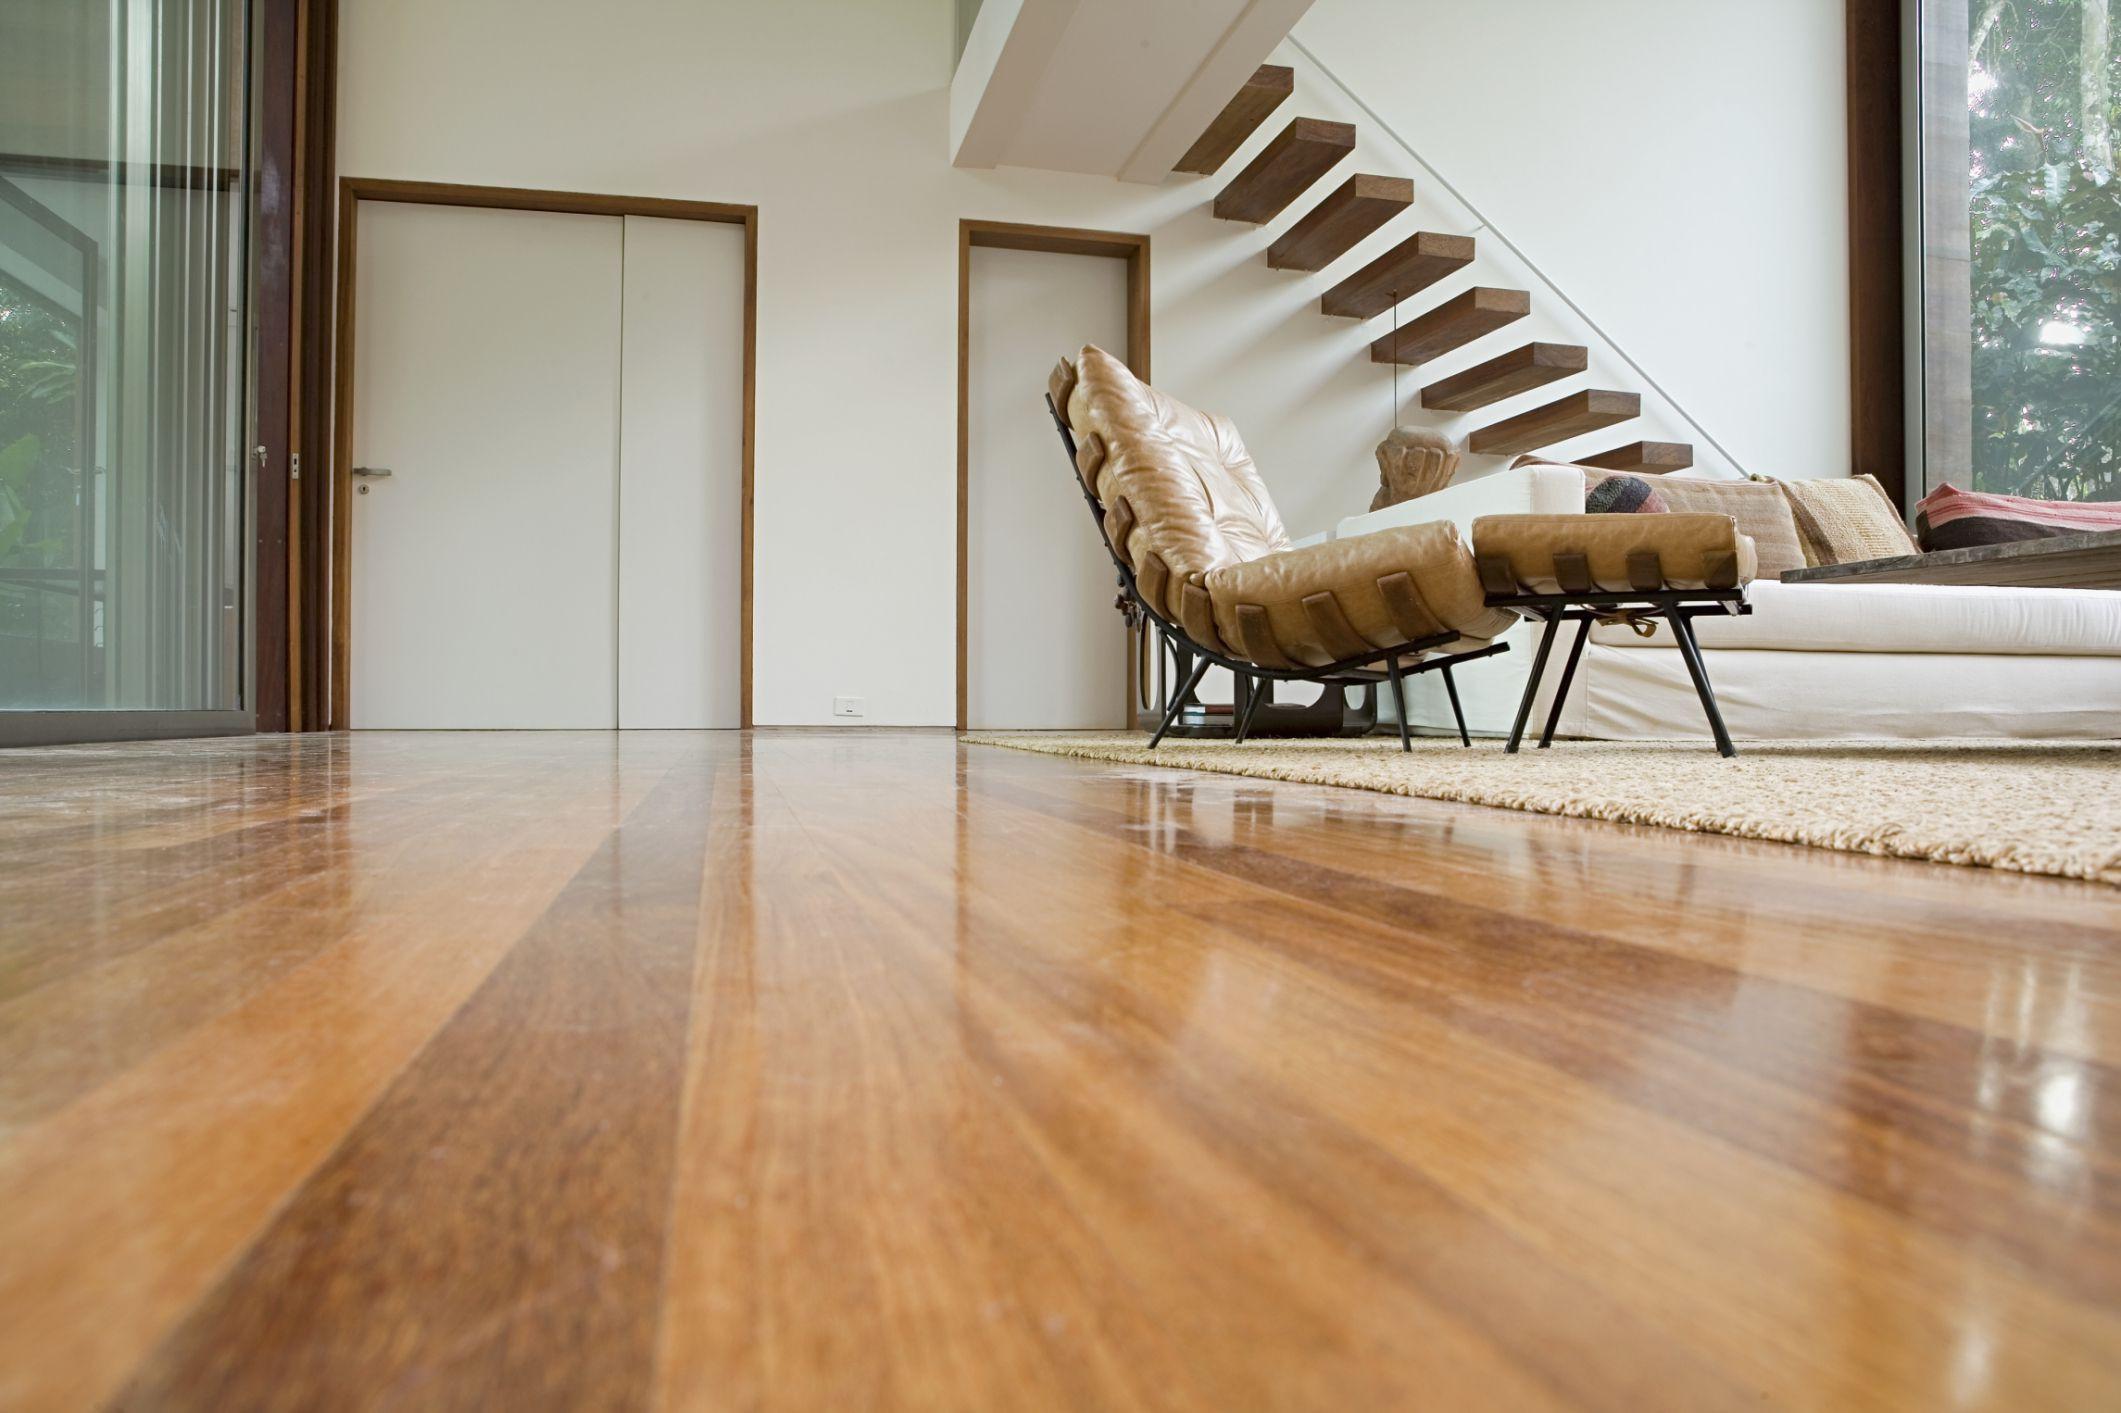 raw hardwood flooring wholesale of engineered wood flooring vs solid wood flooring within 200571260 001 highres 56a49dec5f9b58b7d0d7dc1e